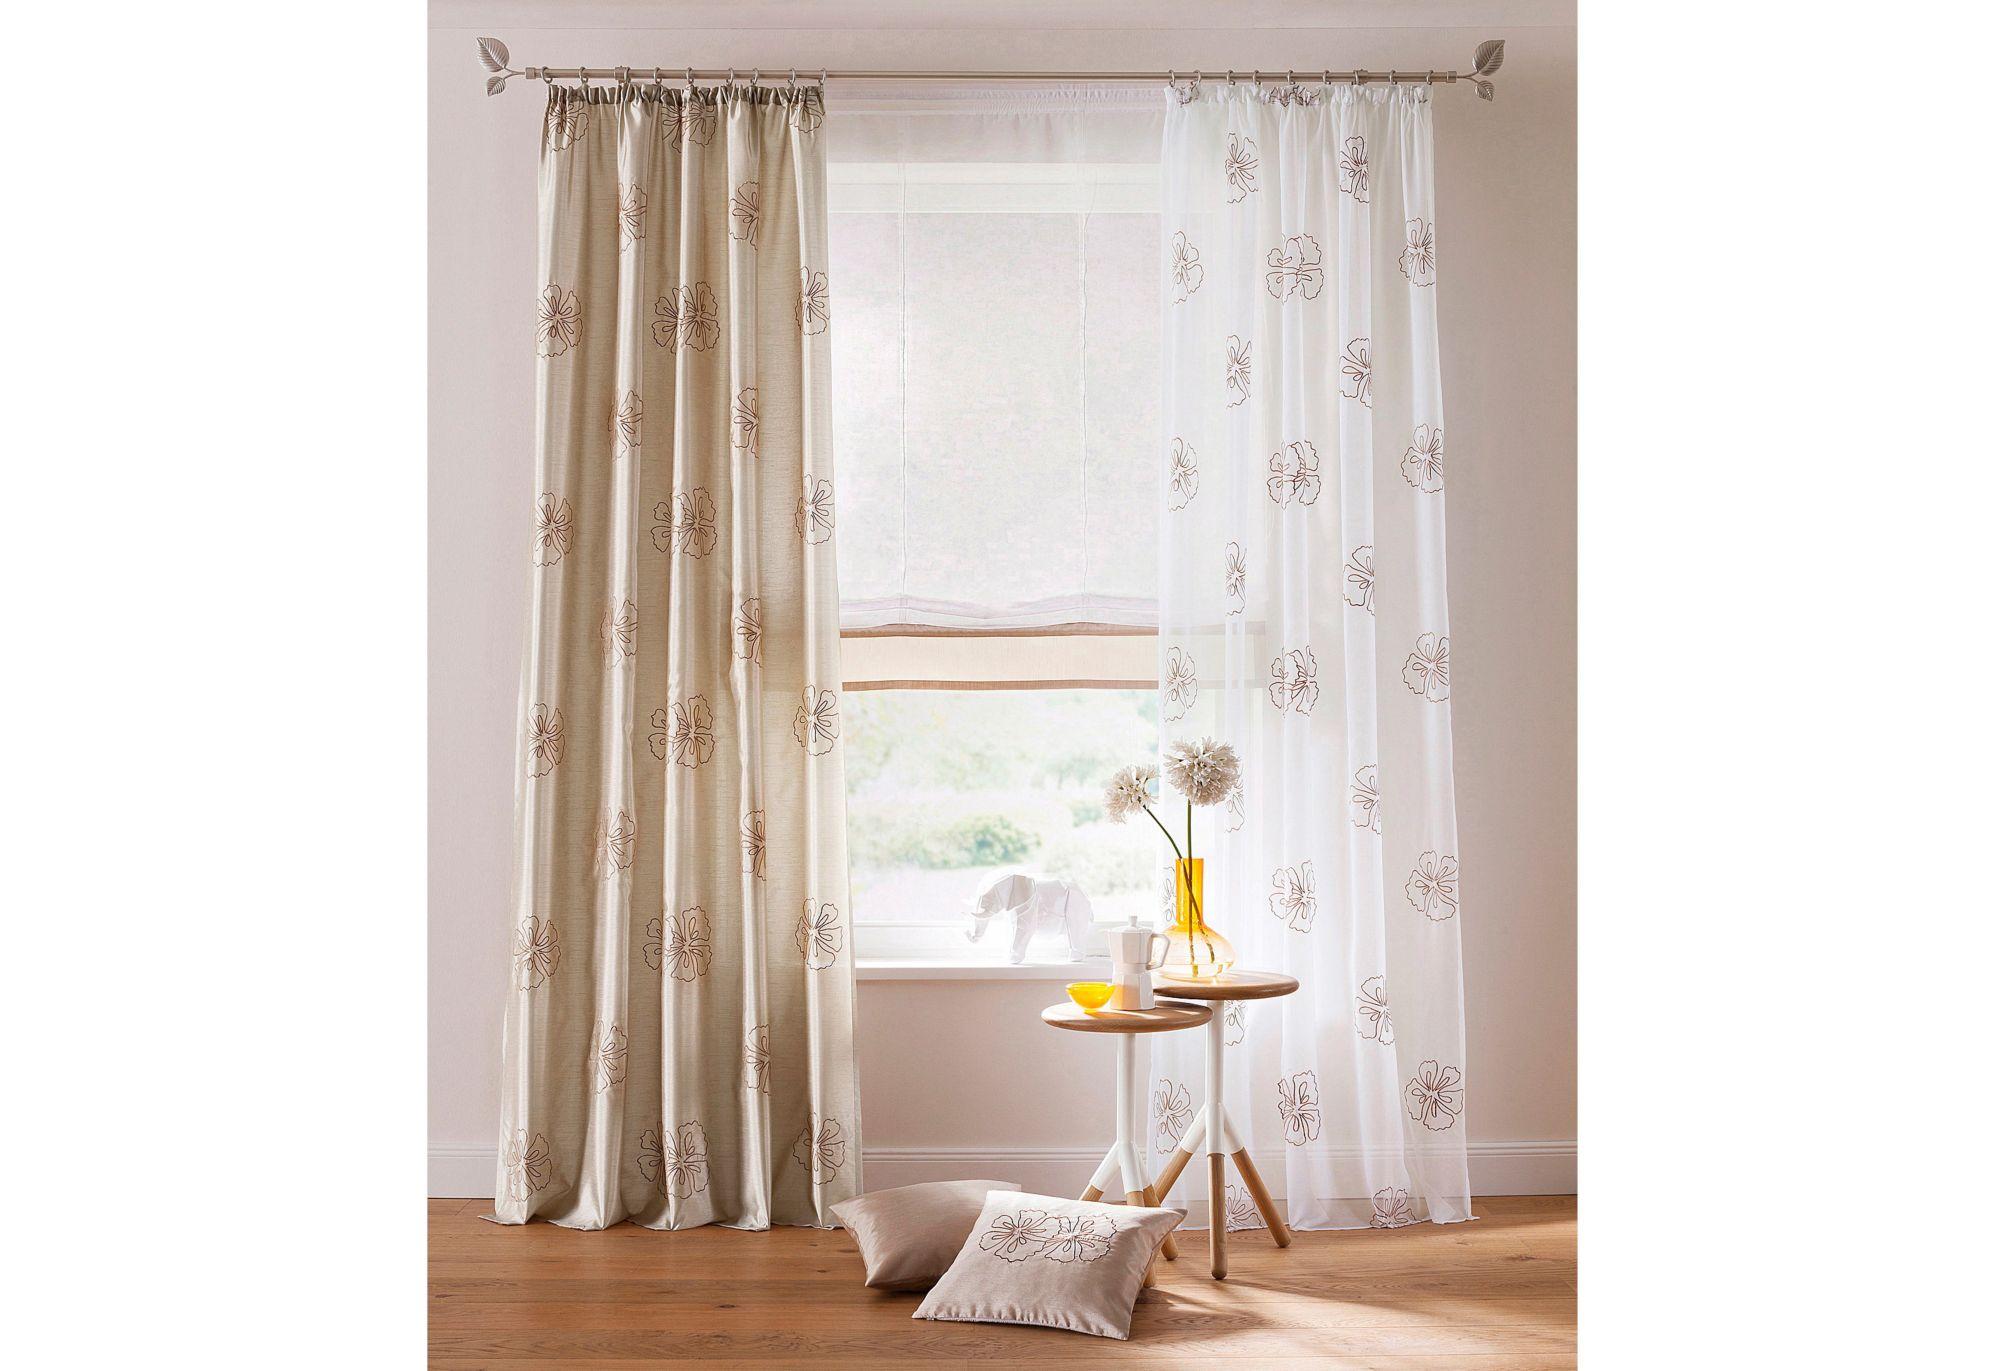 vorhang my home malta 2 st ck schwab versand halbtransparente gardinen. Black Bedroom Furniture Sets. Home Design Ideas